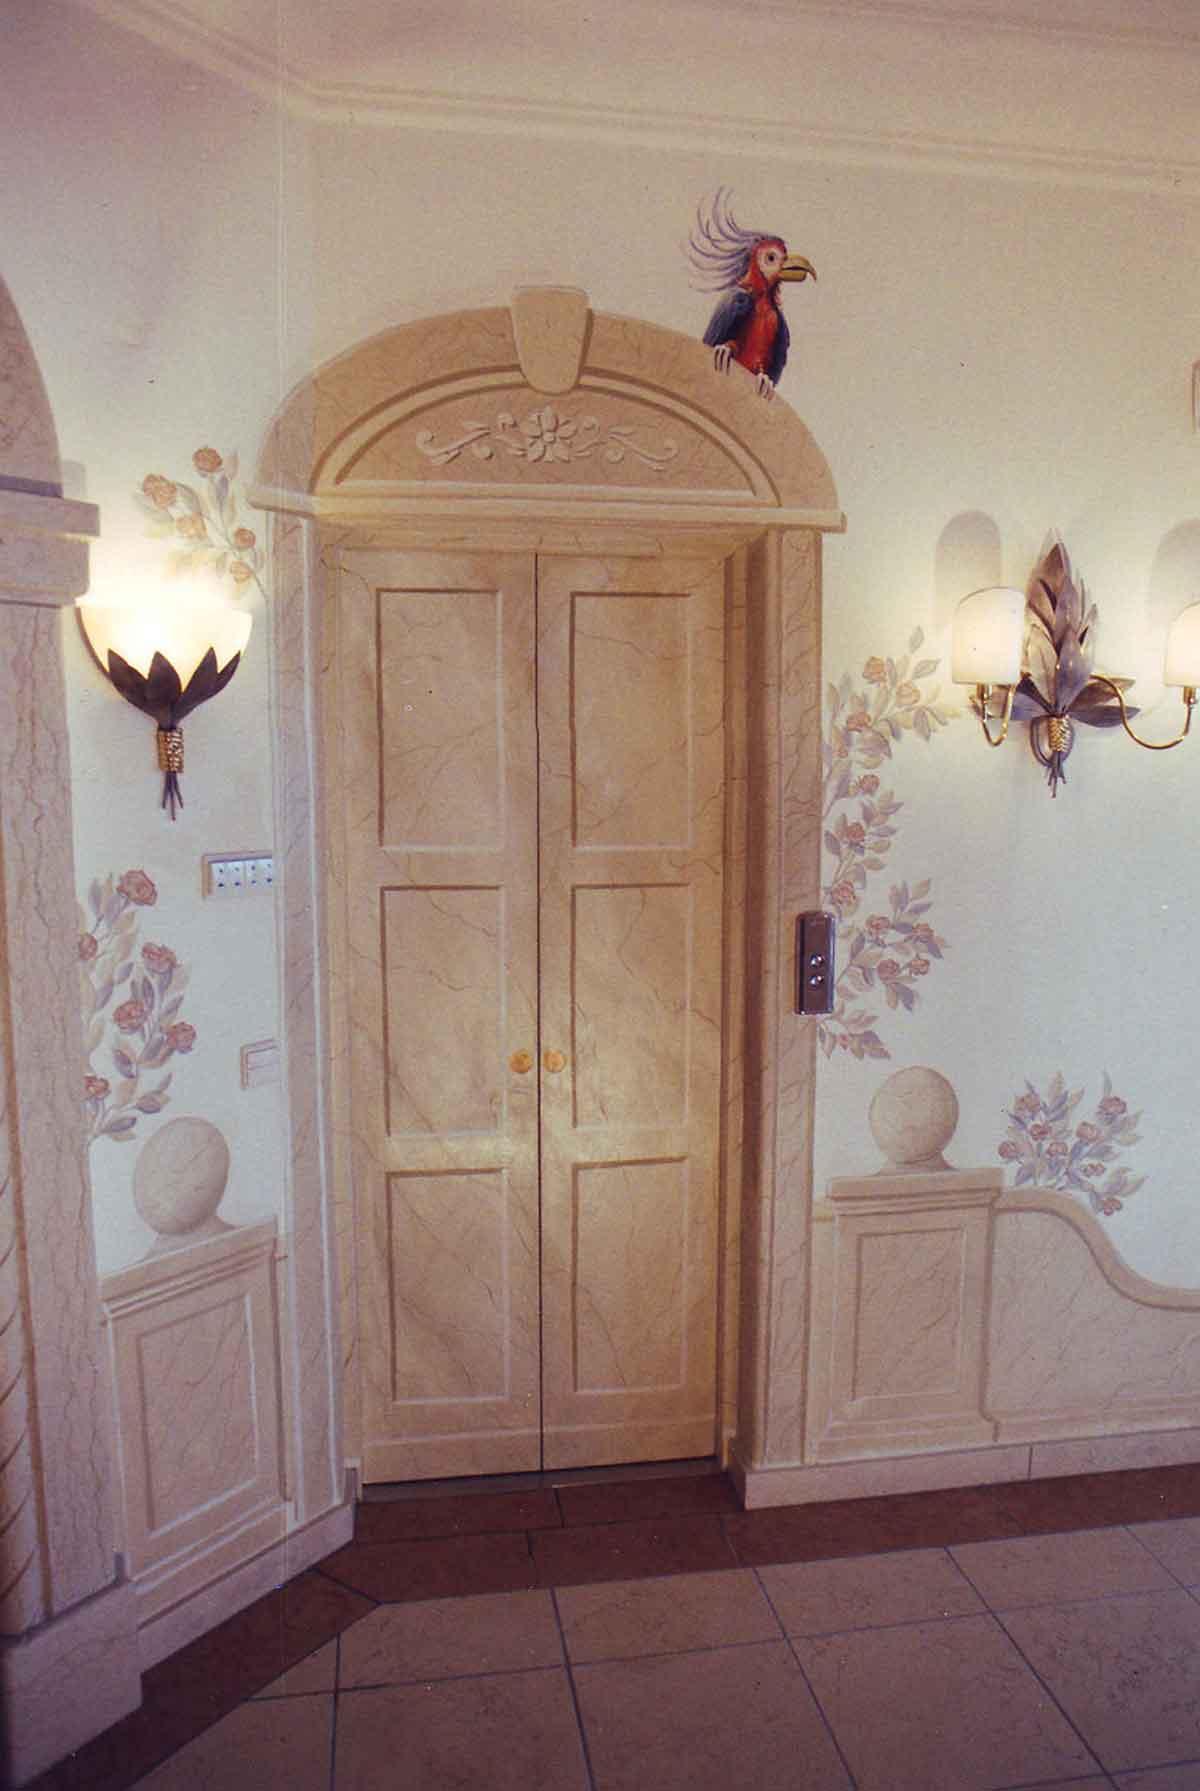 Lifttüren Kunstmalerei - realistische Malerei angepasst an die Materialien rundum